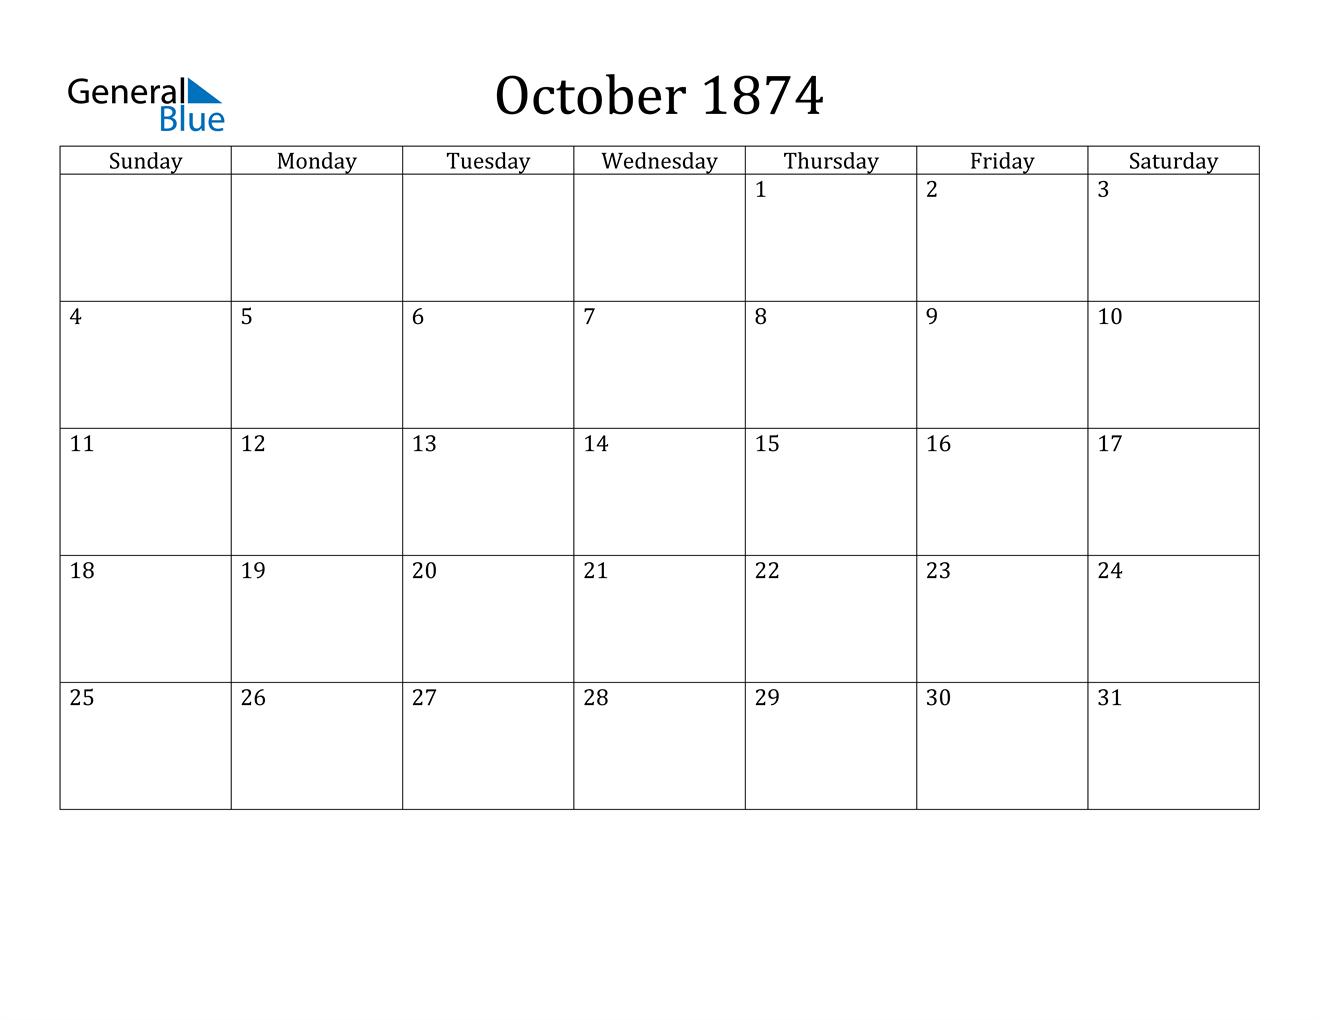 Image of October 1874 Calendar